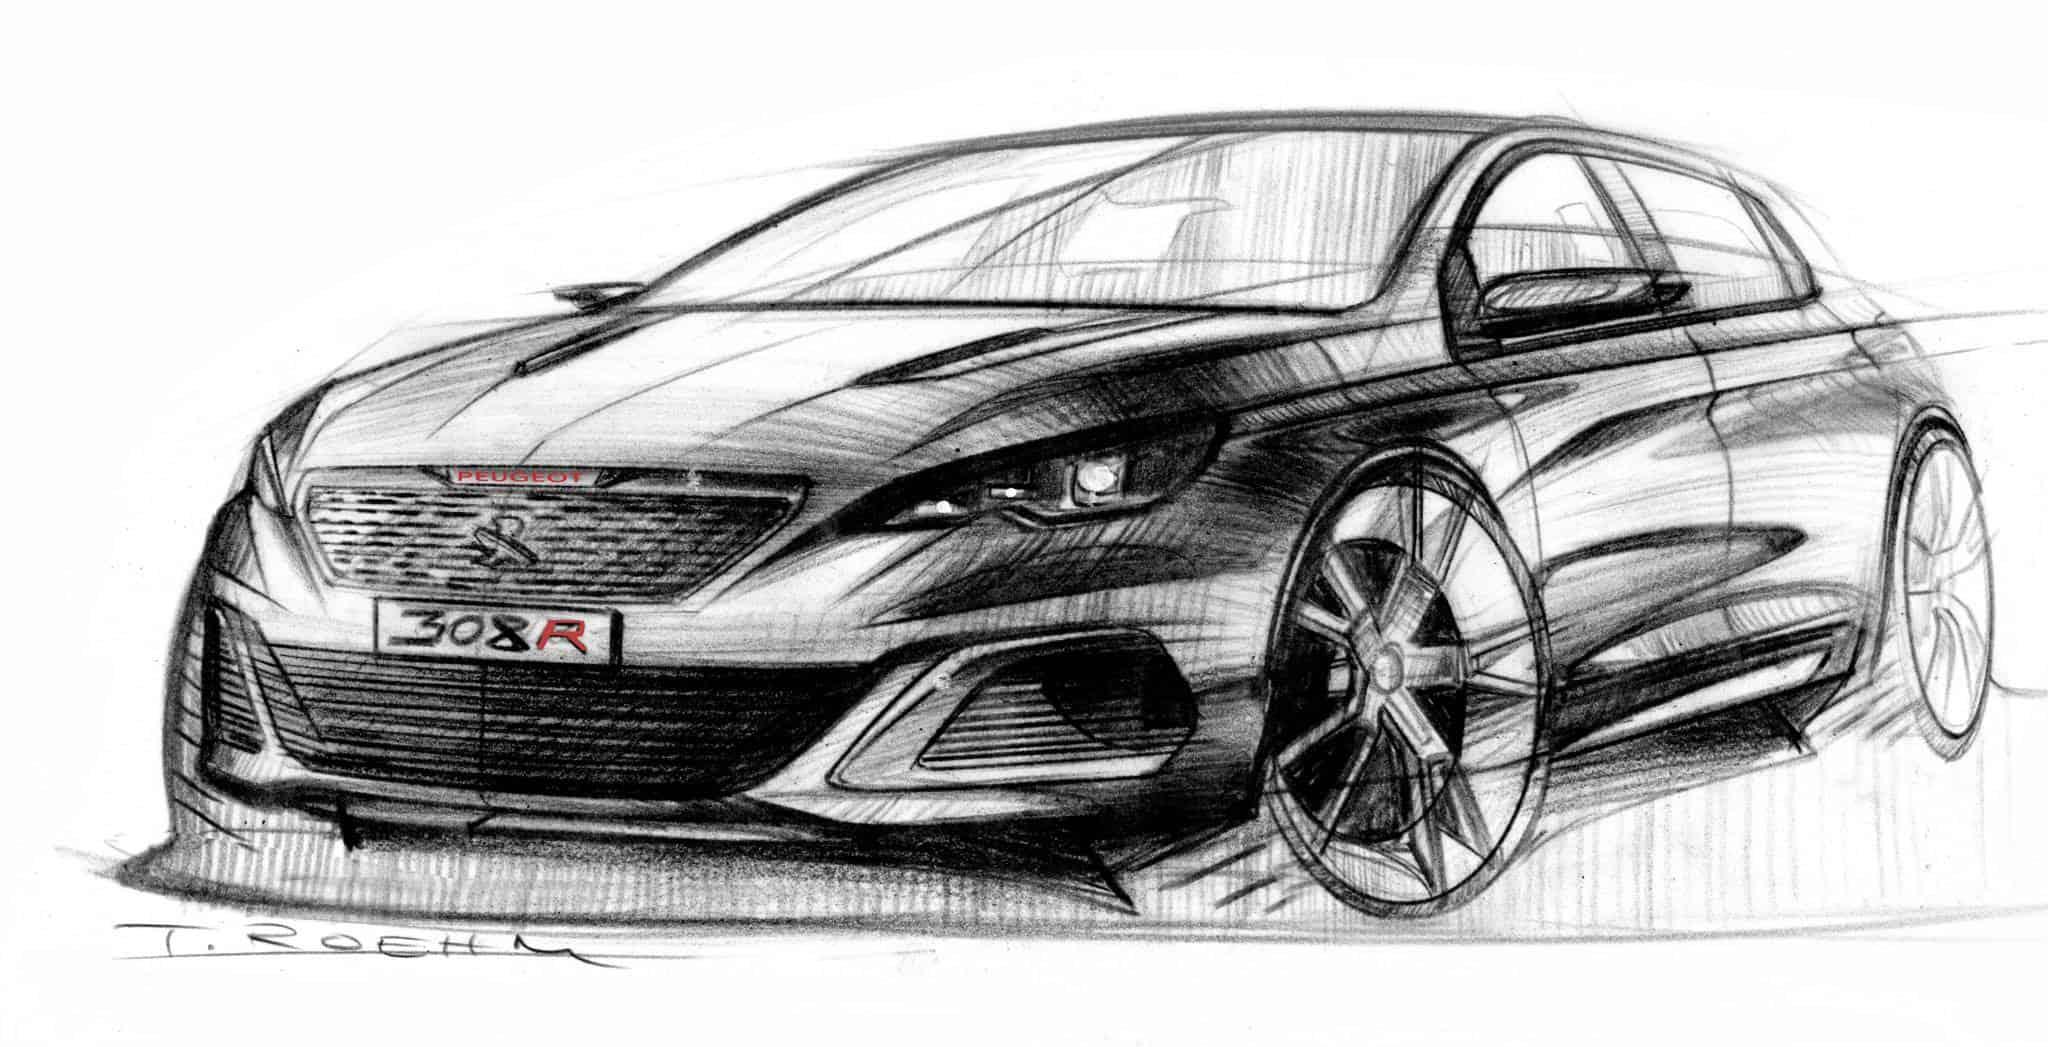 Design-Skizzen Thomas Roehm vom Peugeot 308 R Concept | Auto-Diva ...